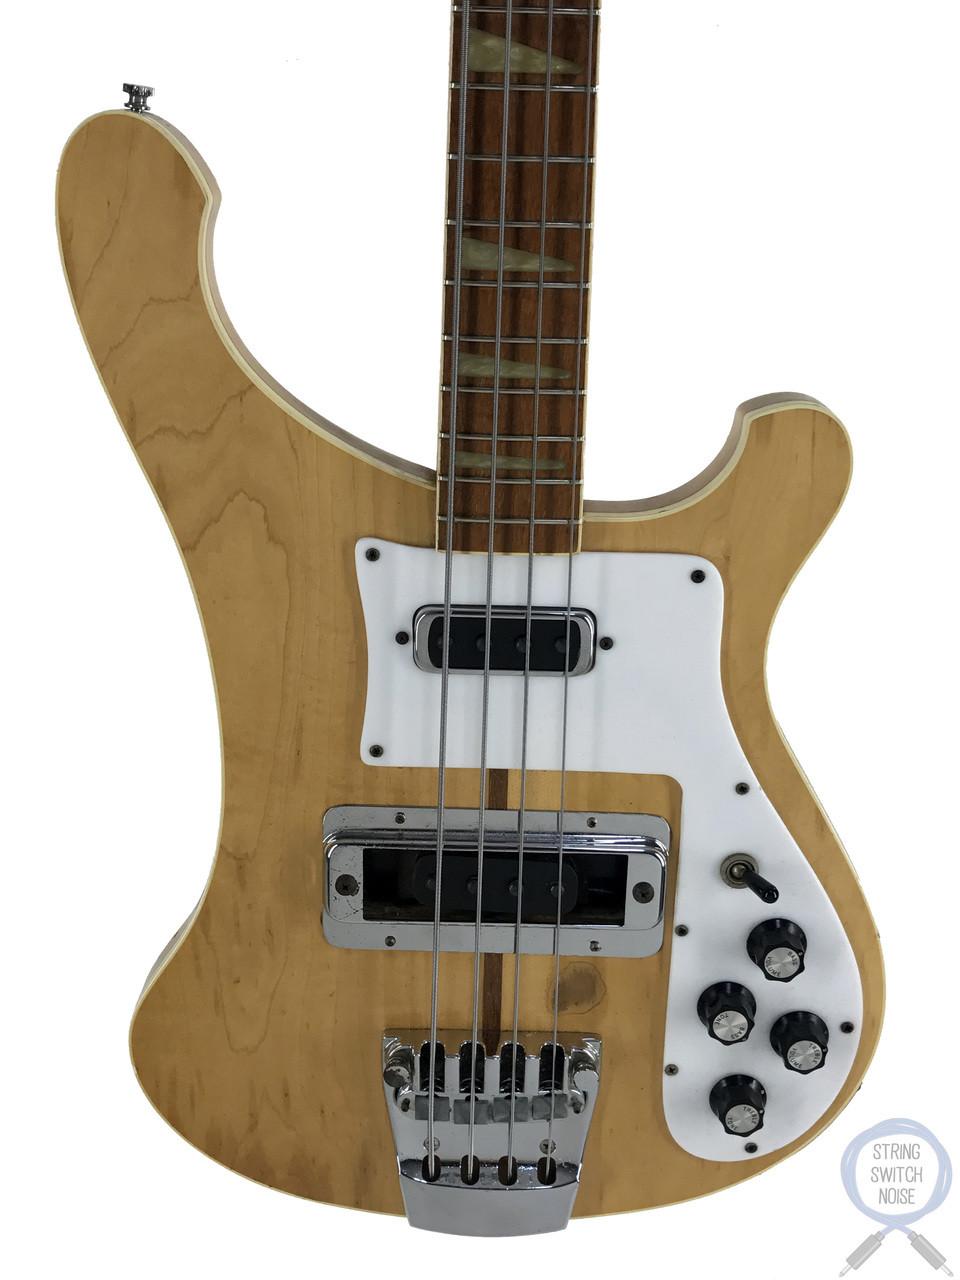 Rickenbacker 4001 Bass, USA 1978 Vintage, Mapleglo, Original Hard Case